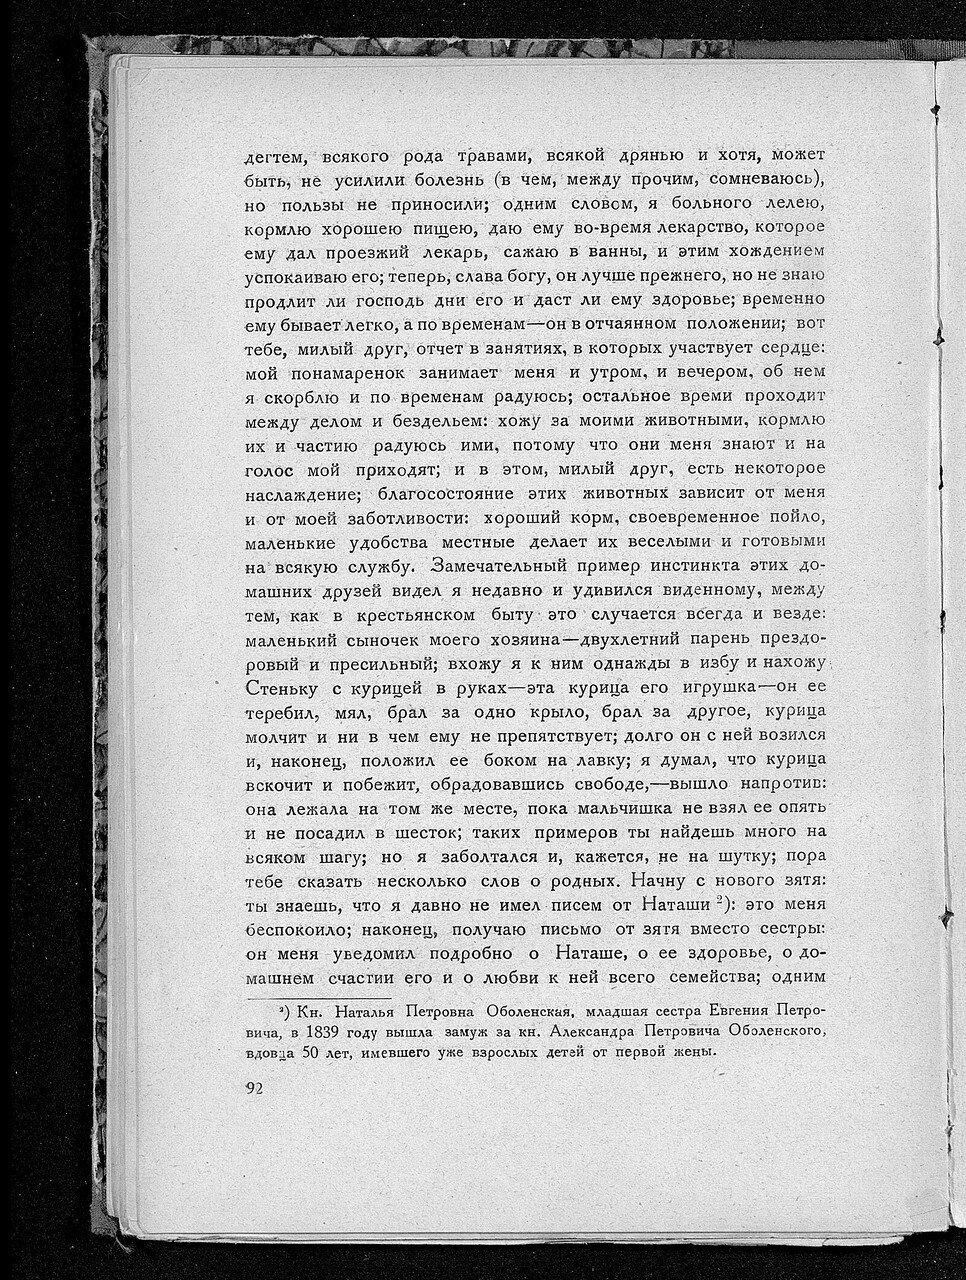 https://img-fotki.yandex.ru/get/3500/199368979.a1/0_214357_21dc5388_XXXL.jpg